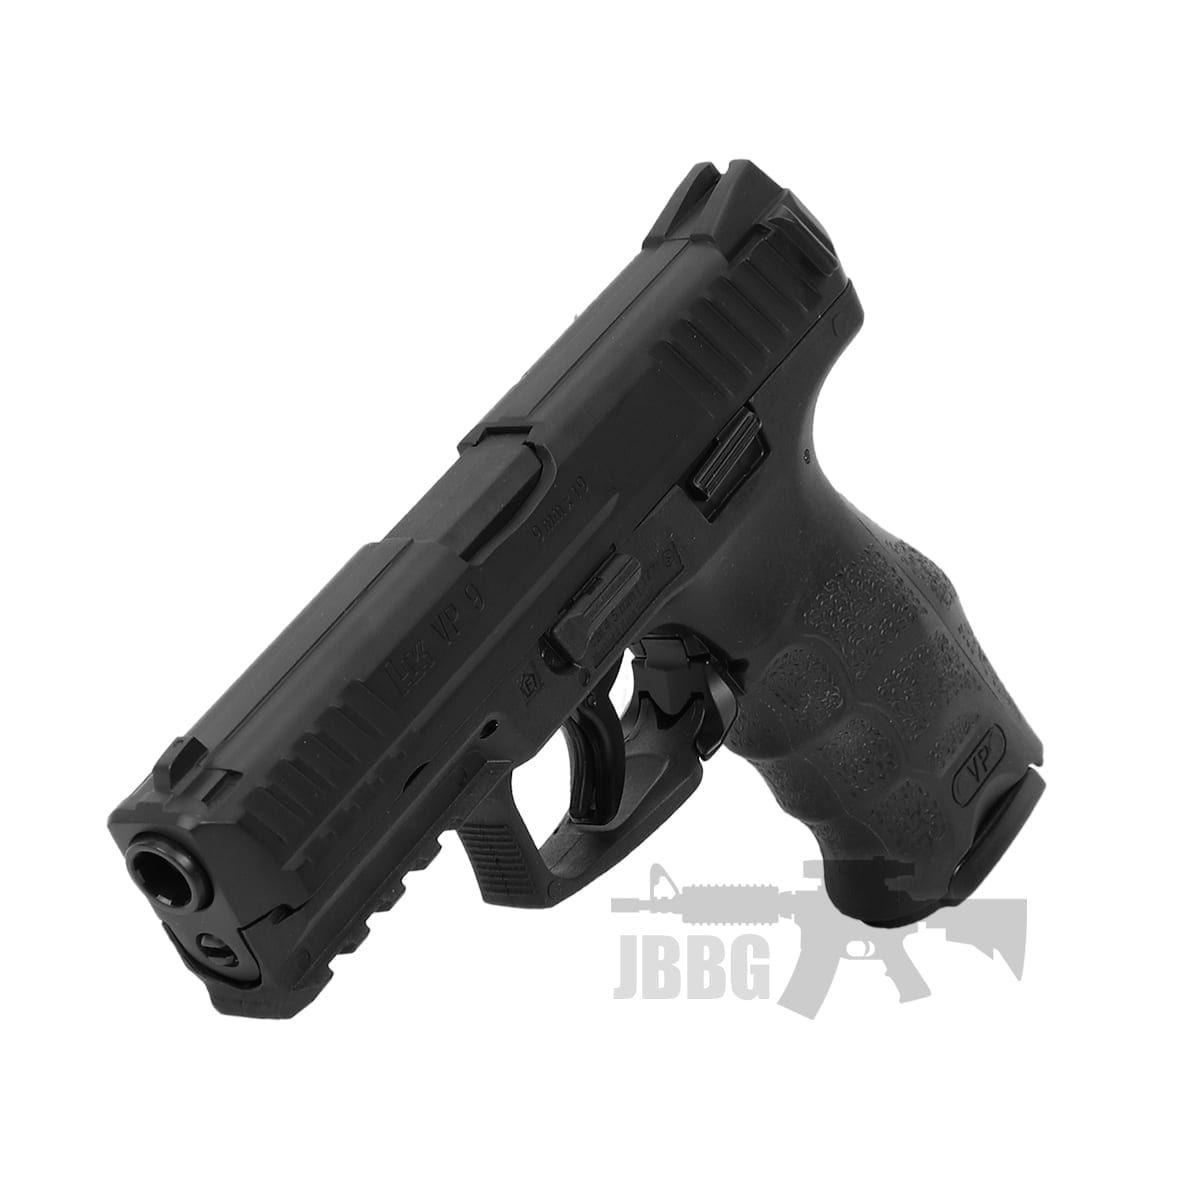 UMAREX H&K VP9 Co2 Air Pistol